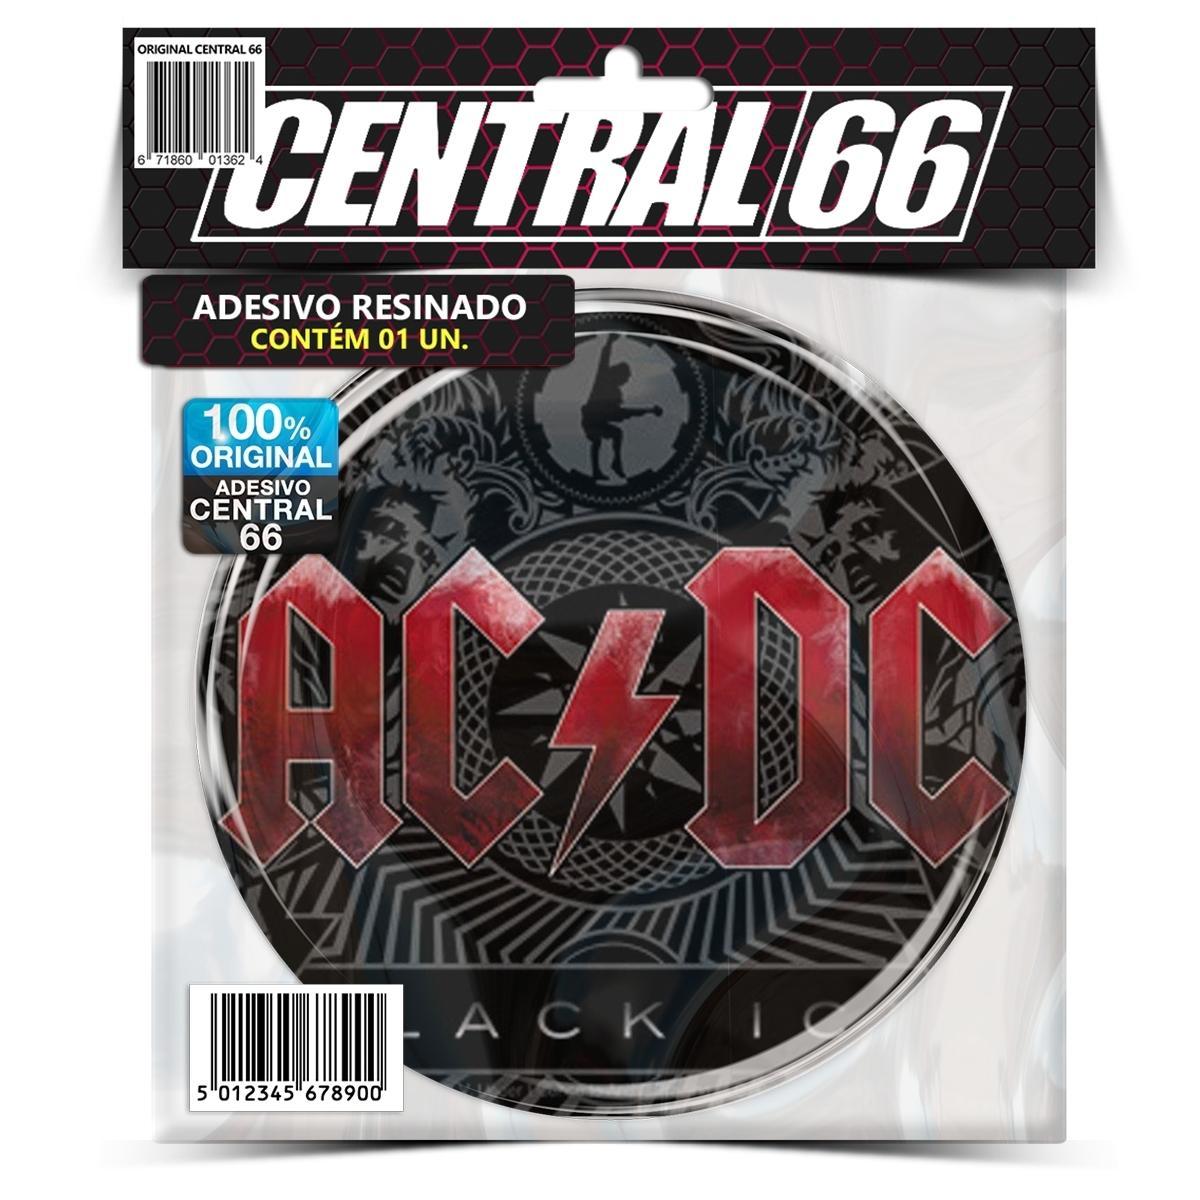 Adesivo Redondo Ac Dc Black Ice – Central 66